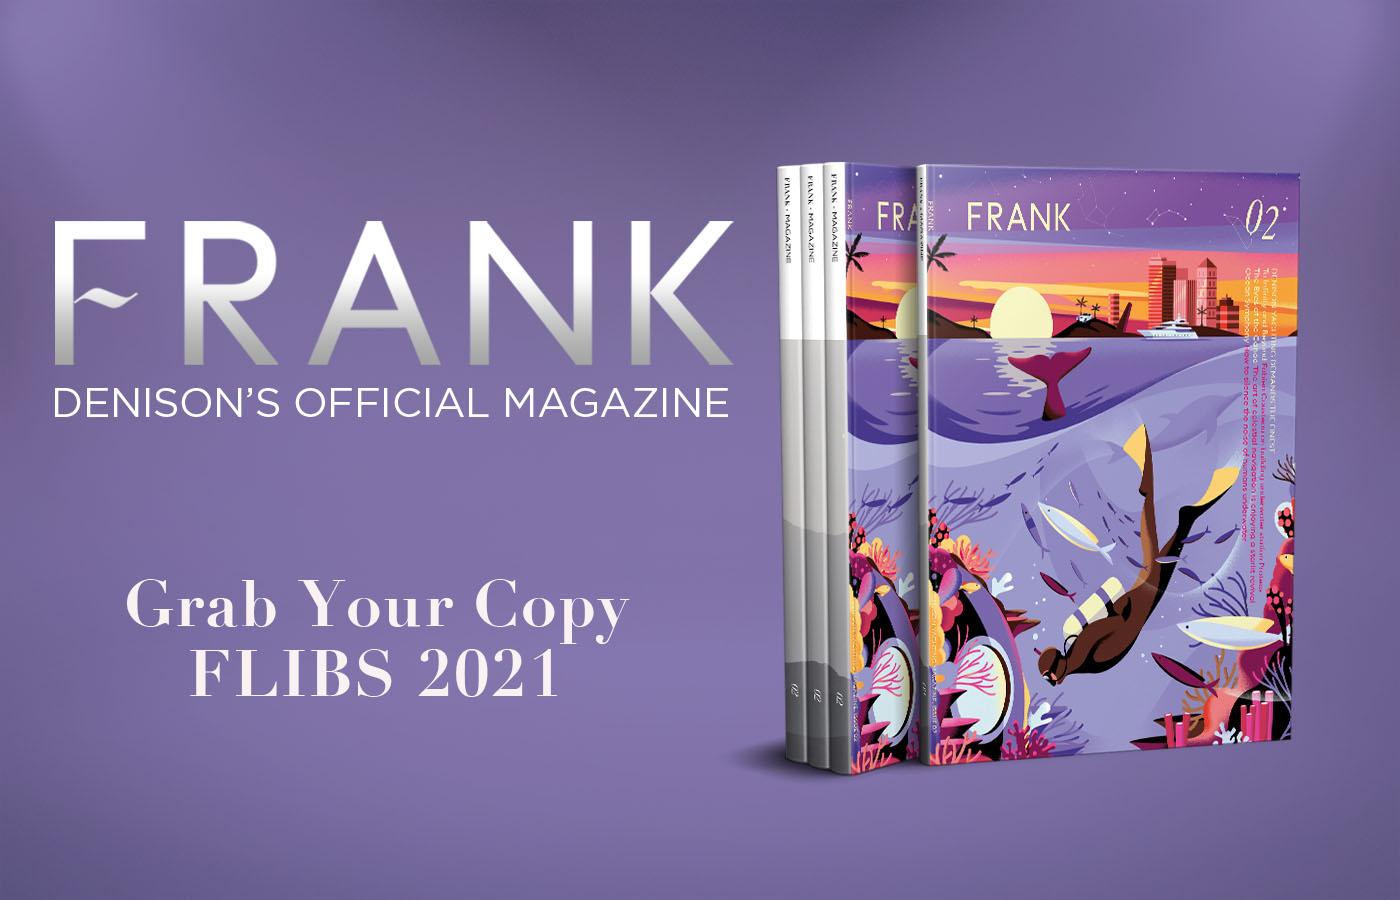 FRANK Magazine | Issue 02